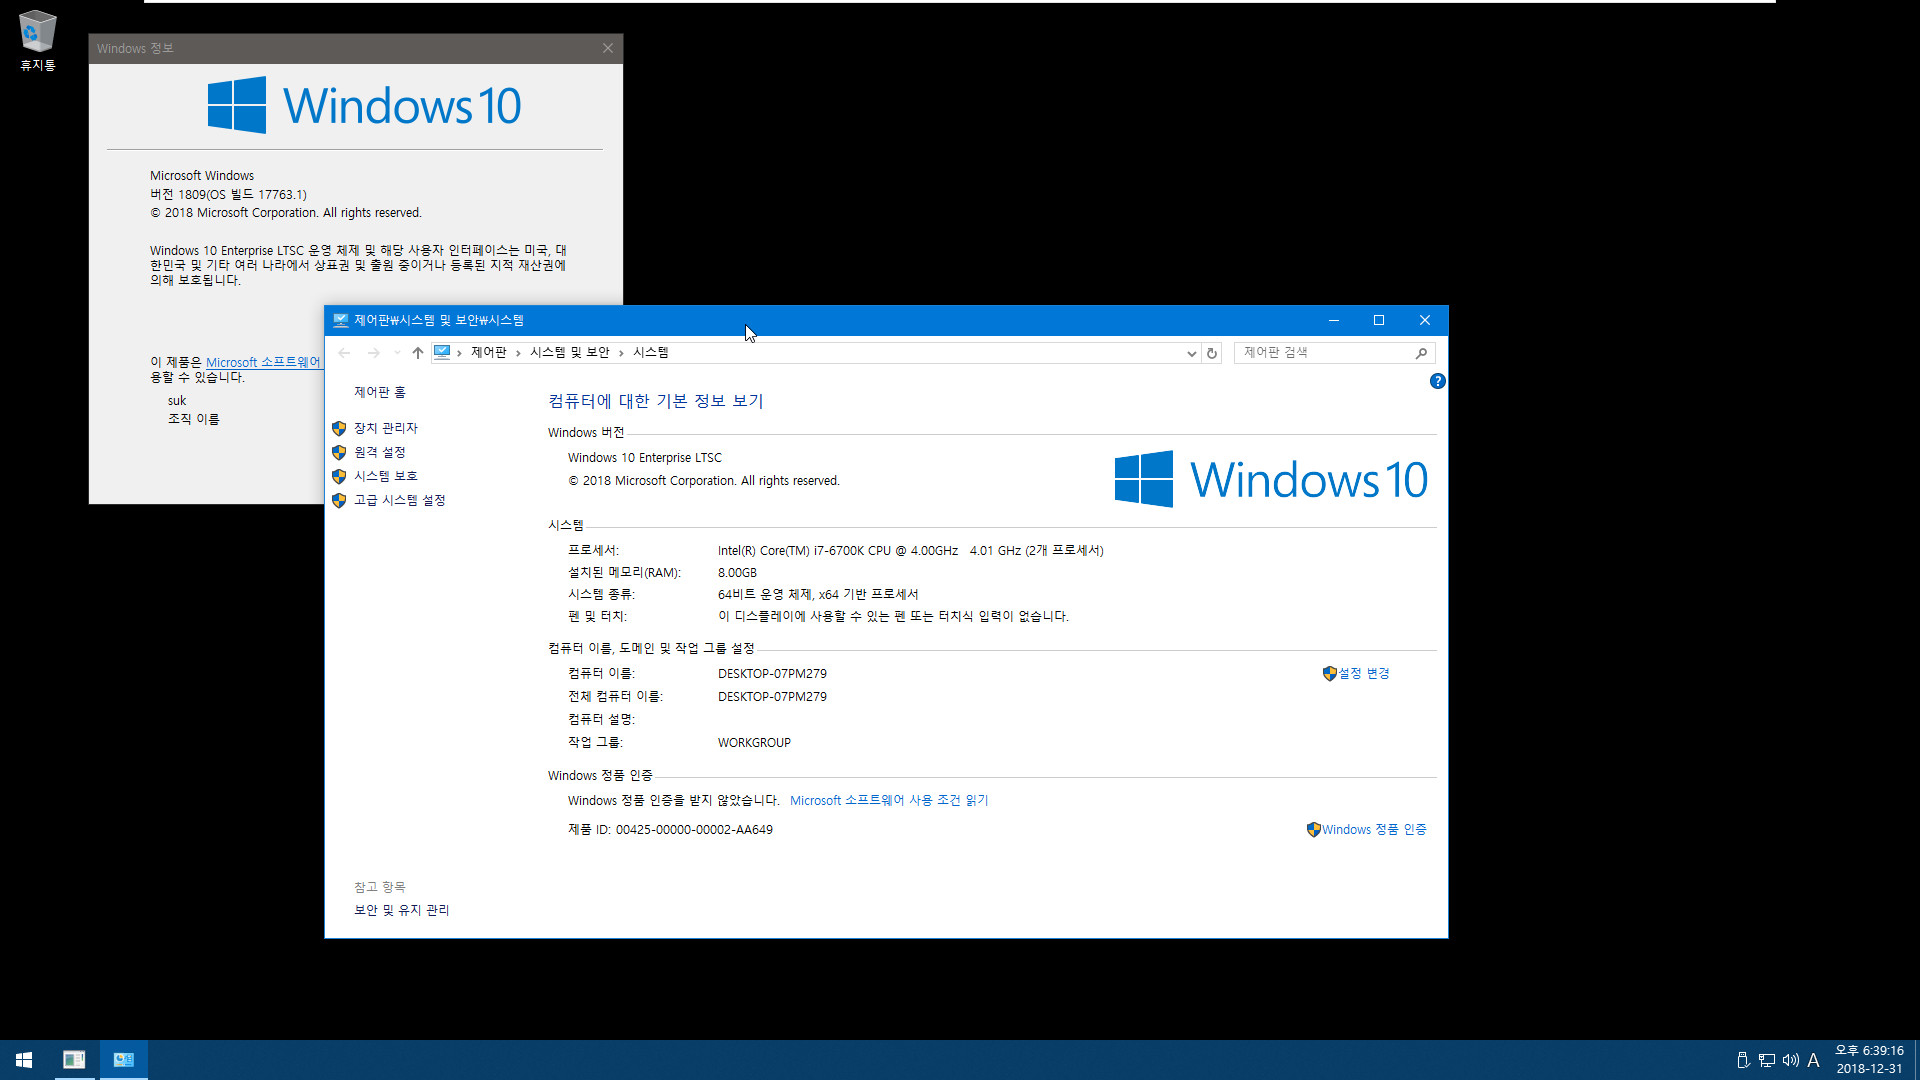 windows 10 2019 다이어트판.iso [2019 LTSC 64비트] - vhd 만들어서 vmware에 연결하여 부팅하기 2018-12-31_183917.jpg